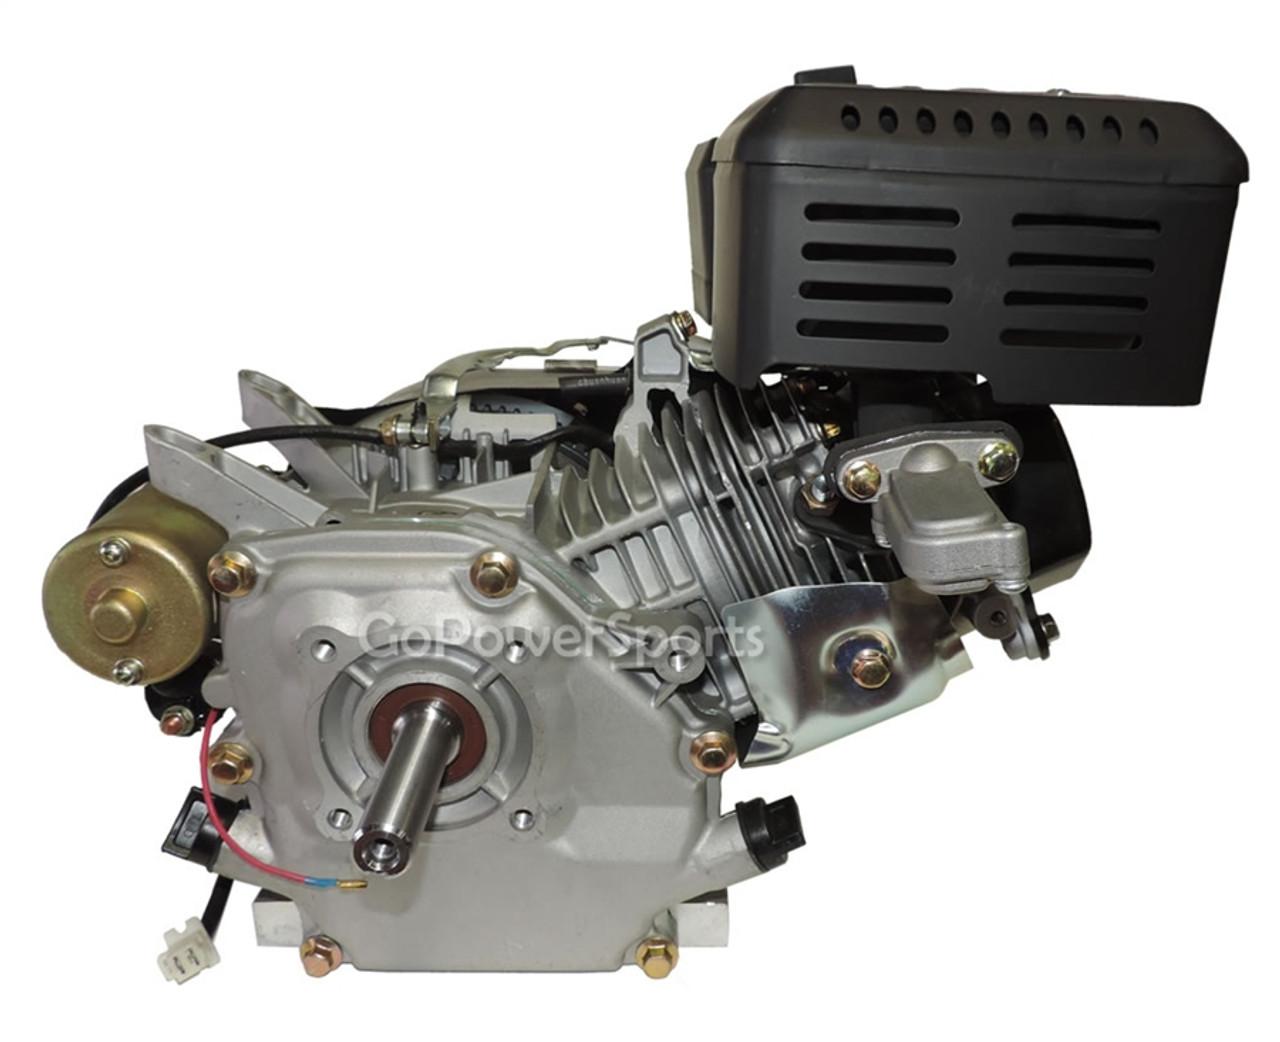 Mid XRX 6.5hp Electric Start Engine -